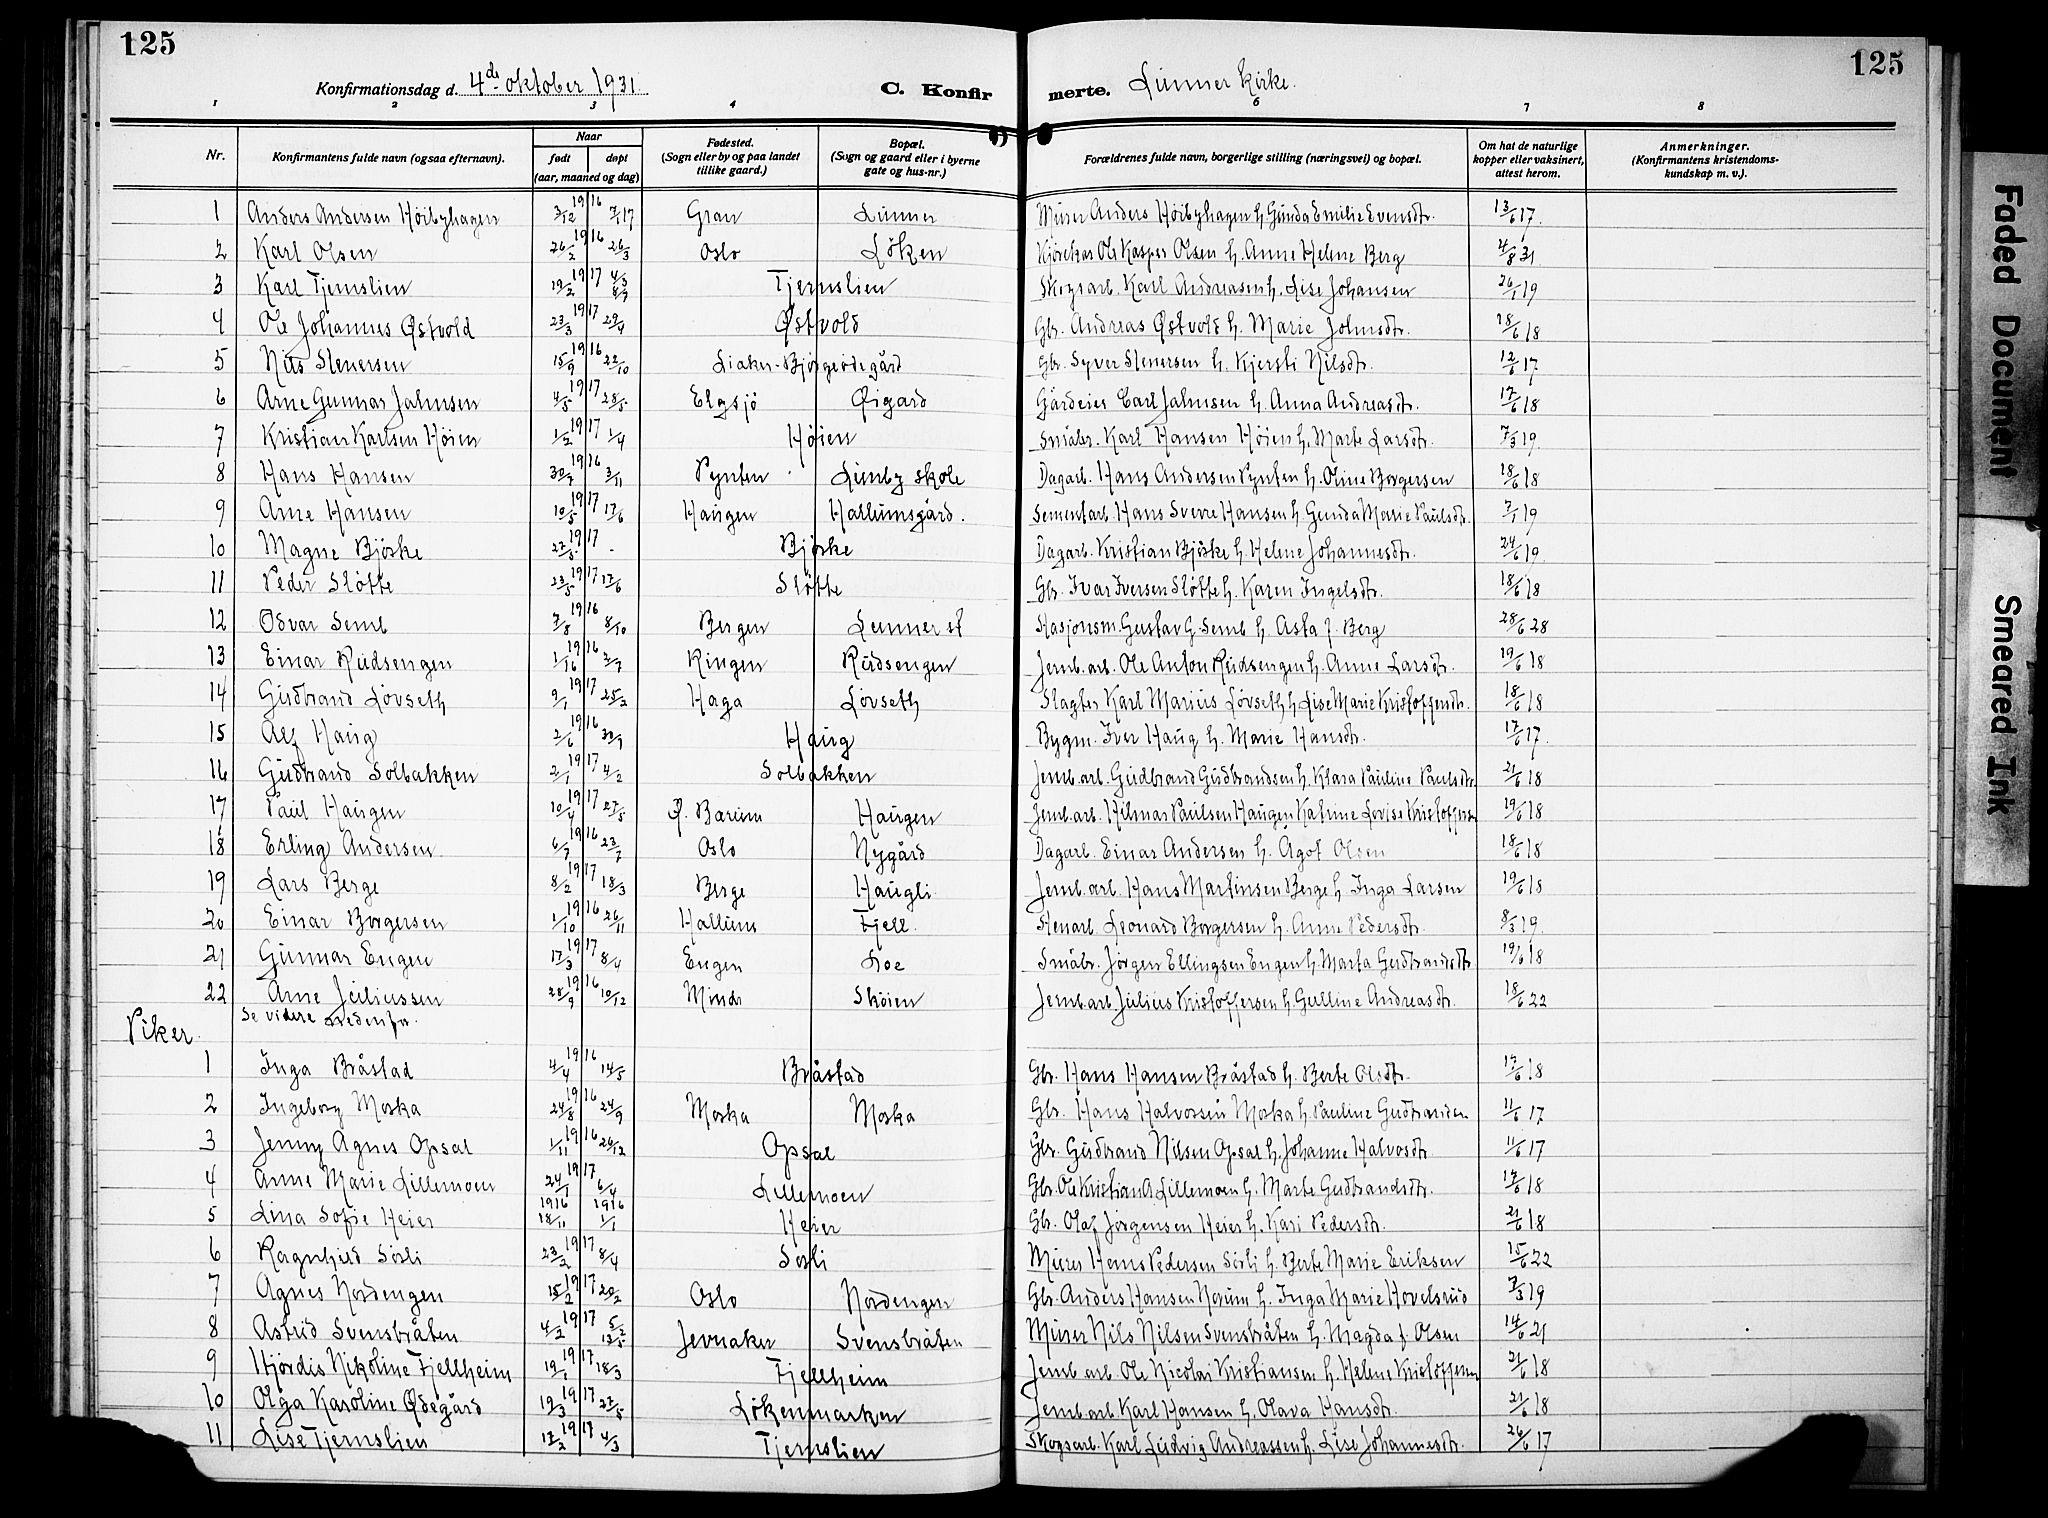 SAH, Lunner prestekontor, H/Ha/Hab/L0002: Klokkerbok nr. 2, 1923-1933, s. 125